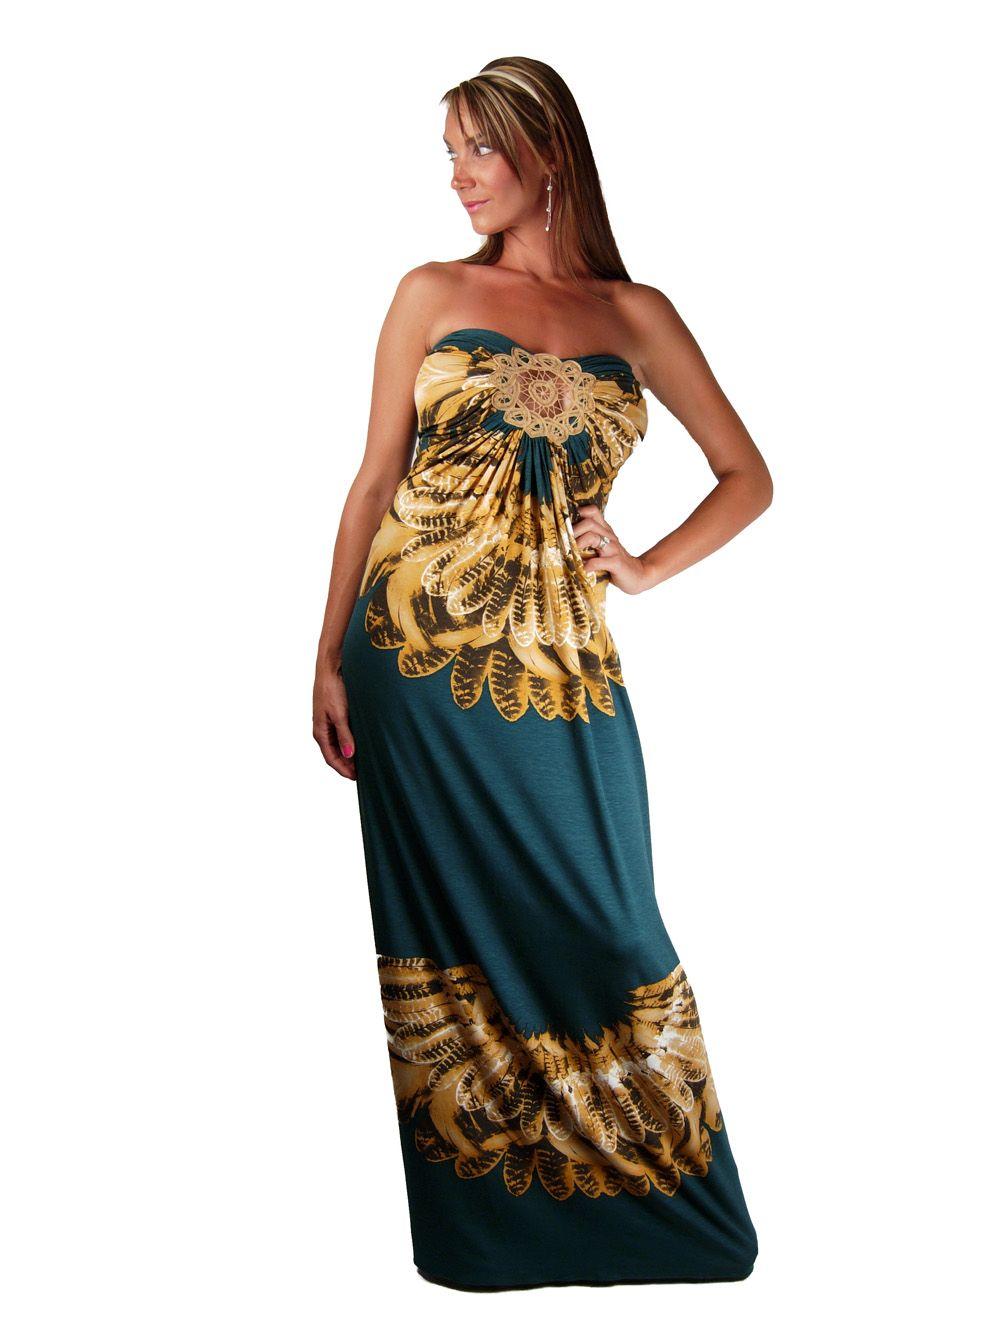 Sky Odin dress in beautiful Fall colors $152